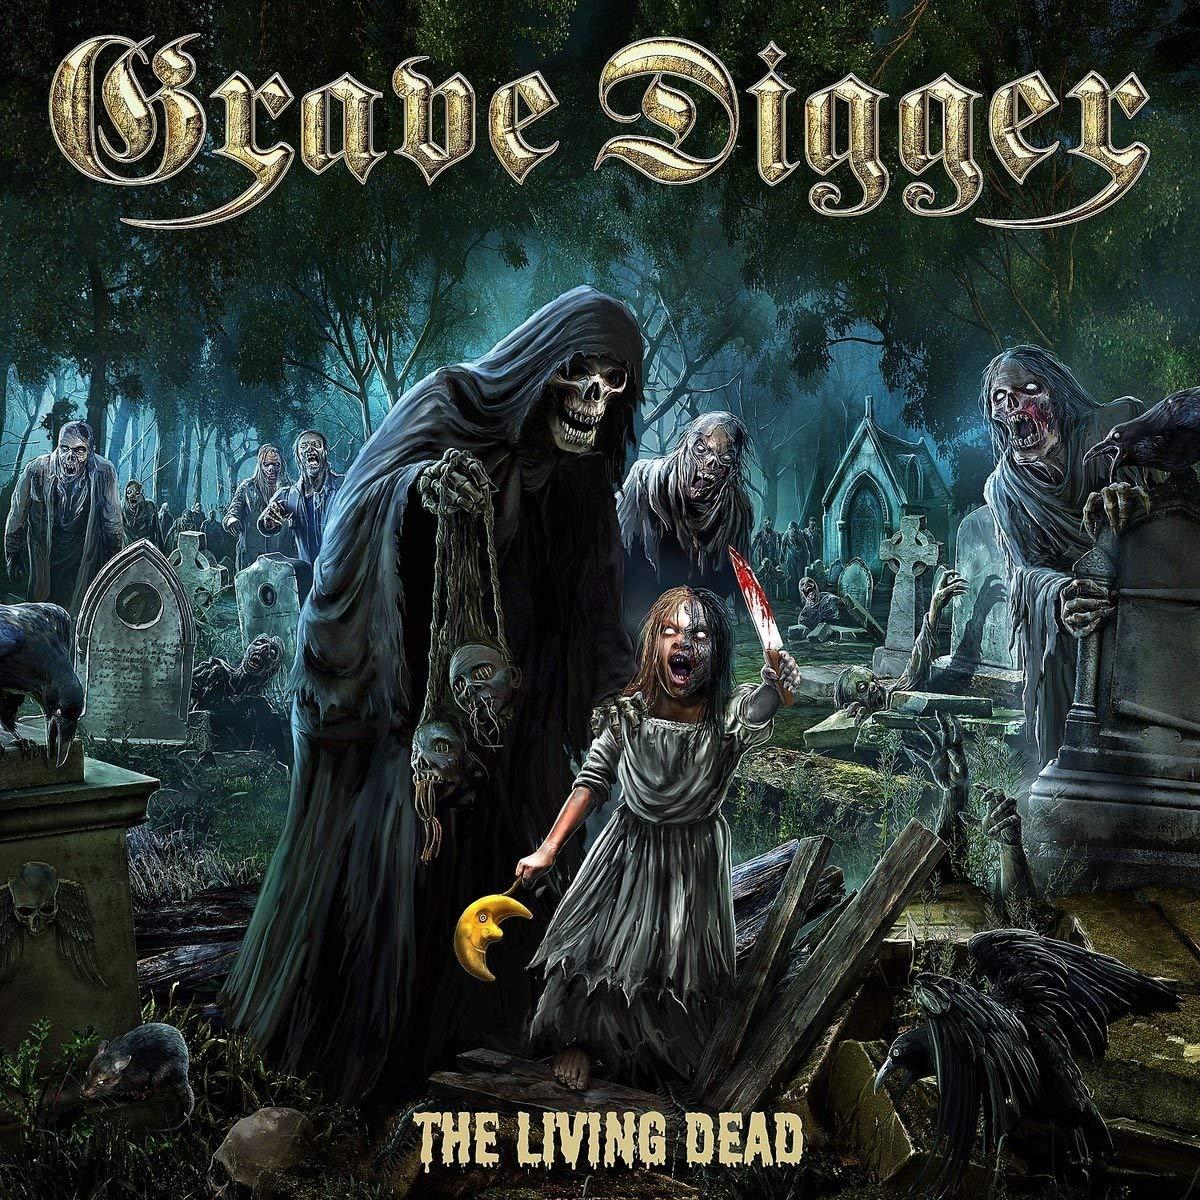 CD : Grave Digger - Living Dead (CD)